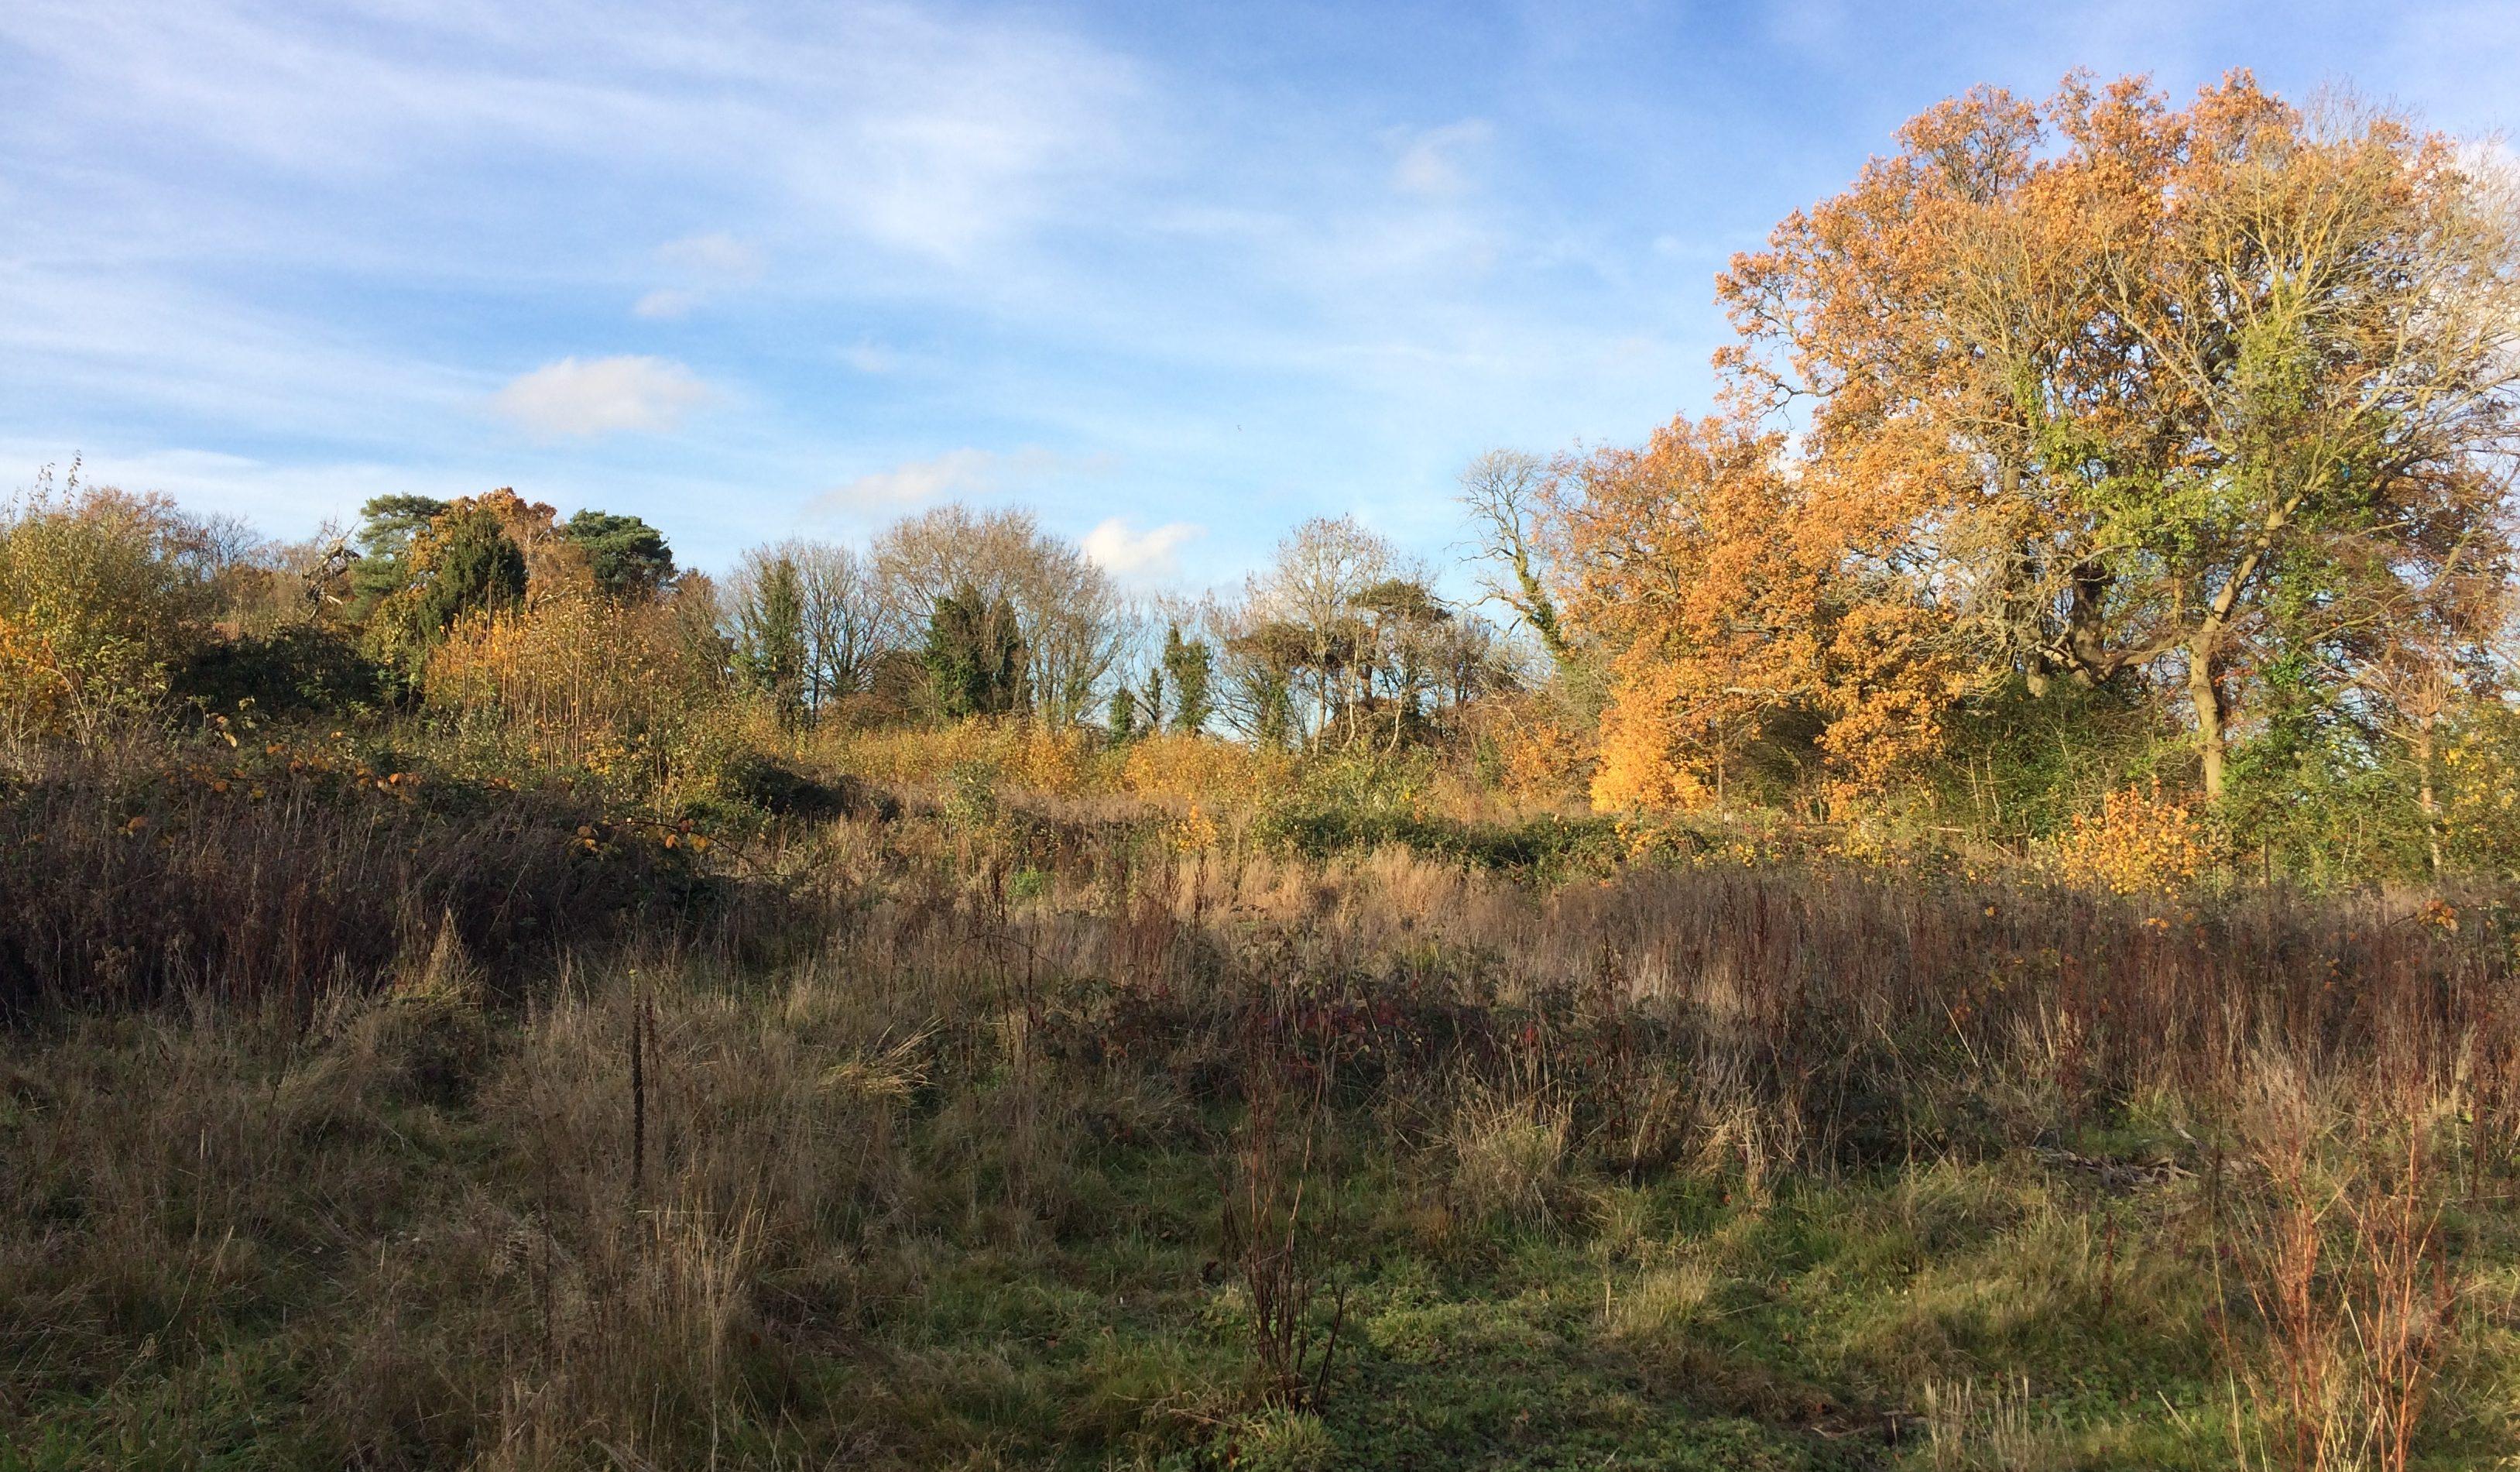 image of scrub land near hurst green